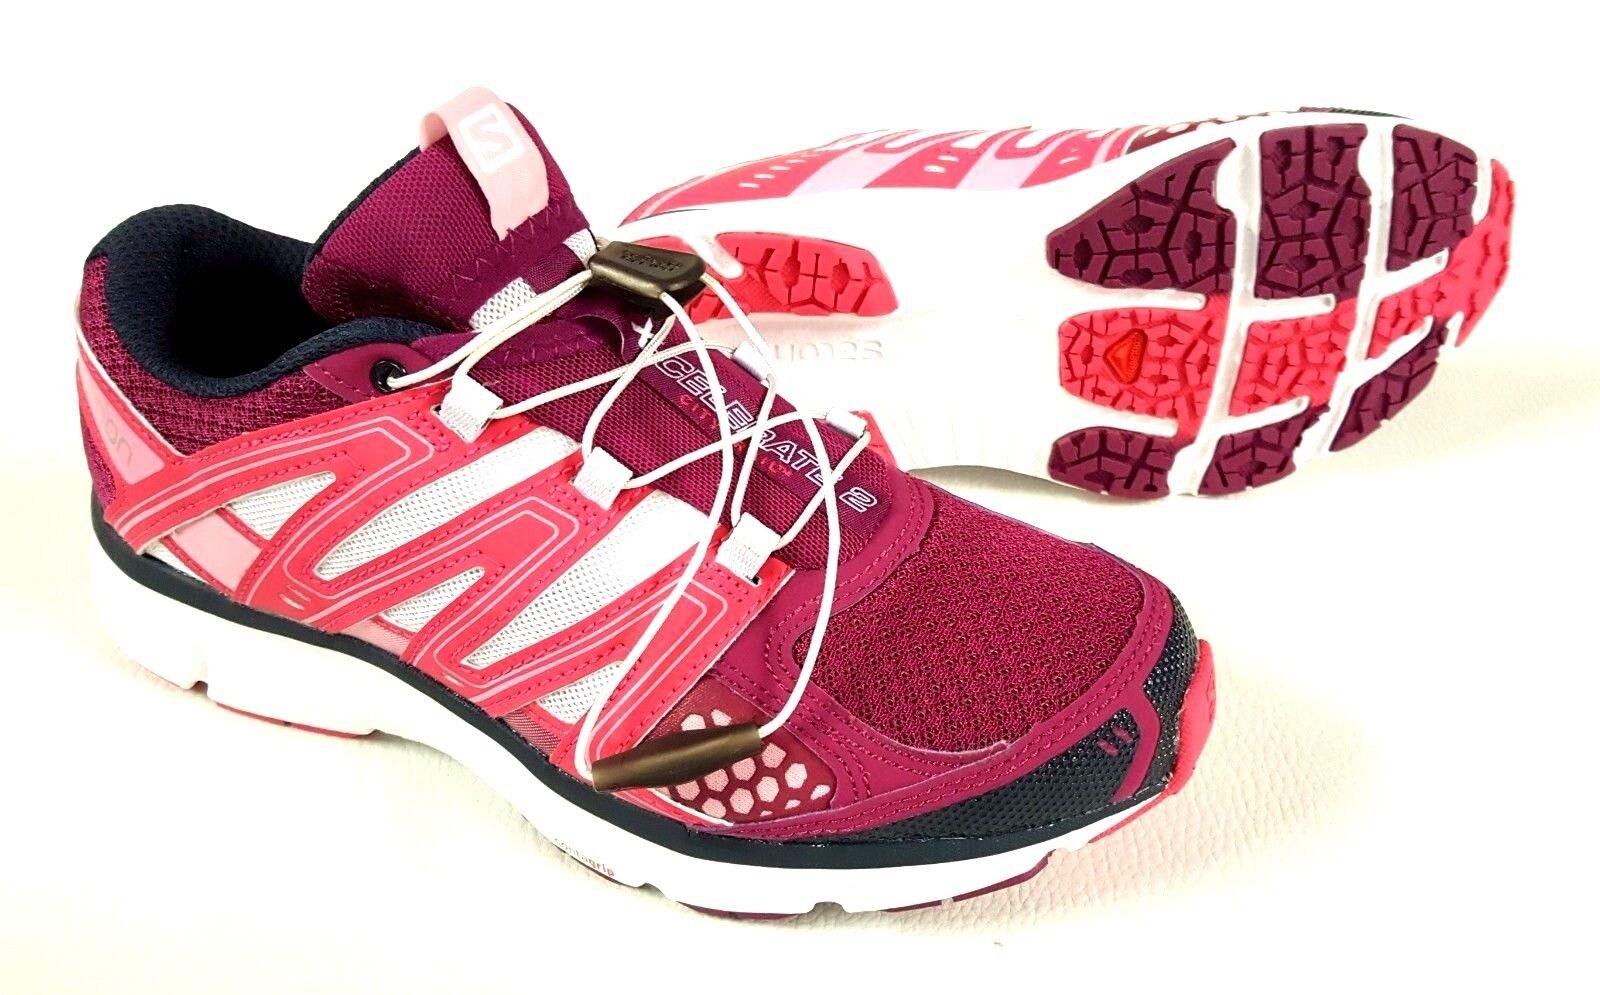 Salomon X-celerate señora zapatillas citytrail zapatos zapatillas deportivas púrpura